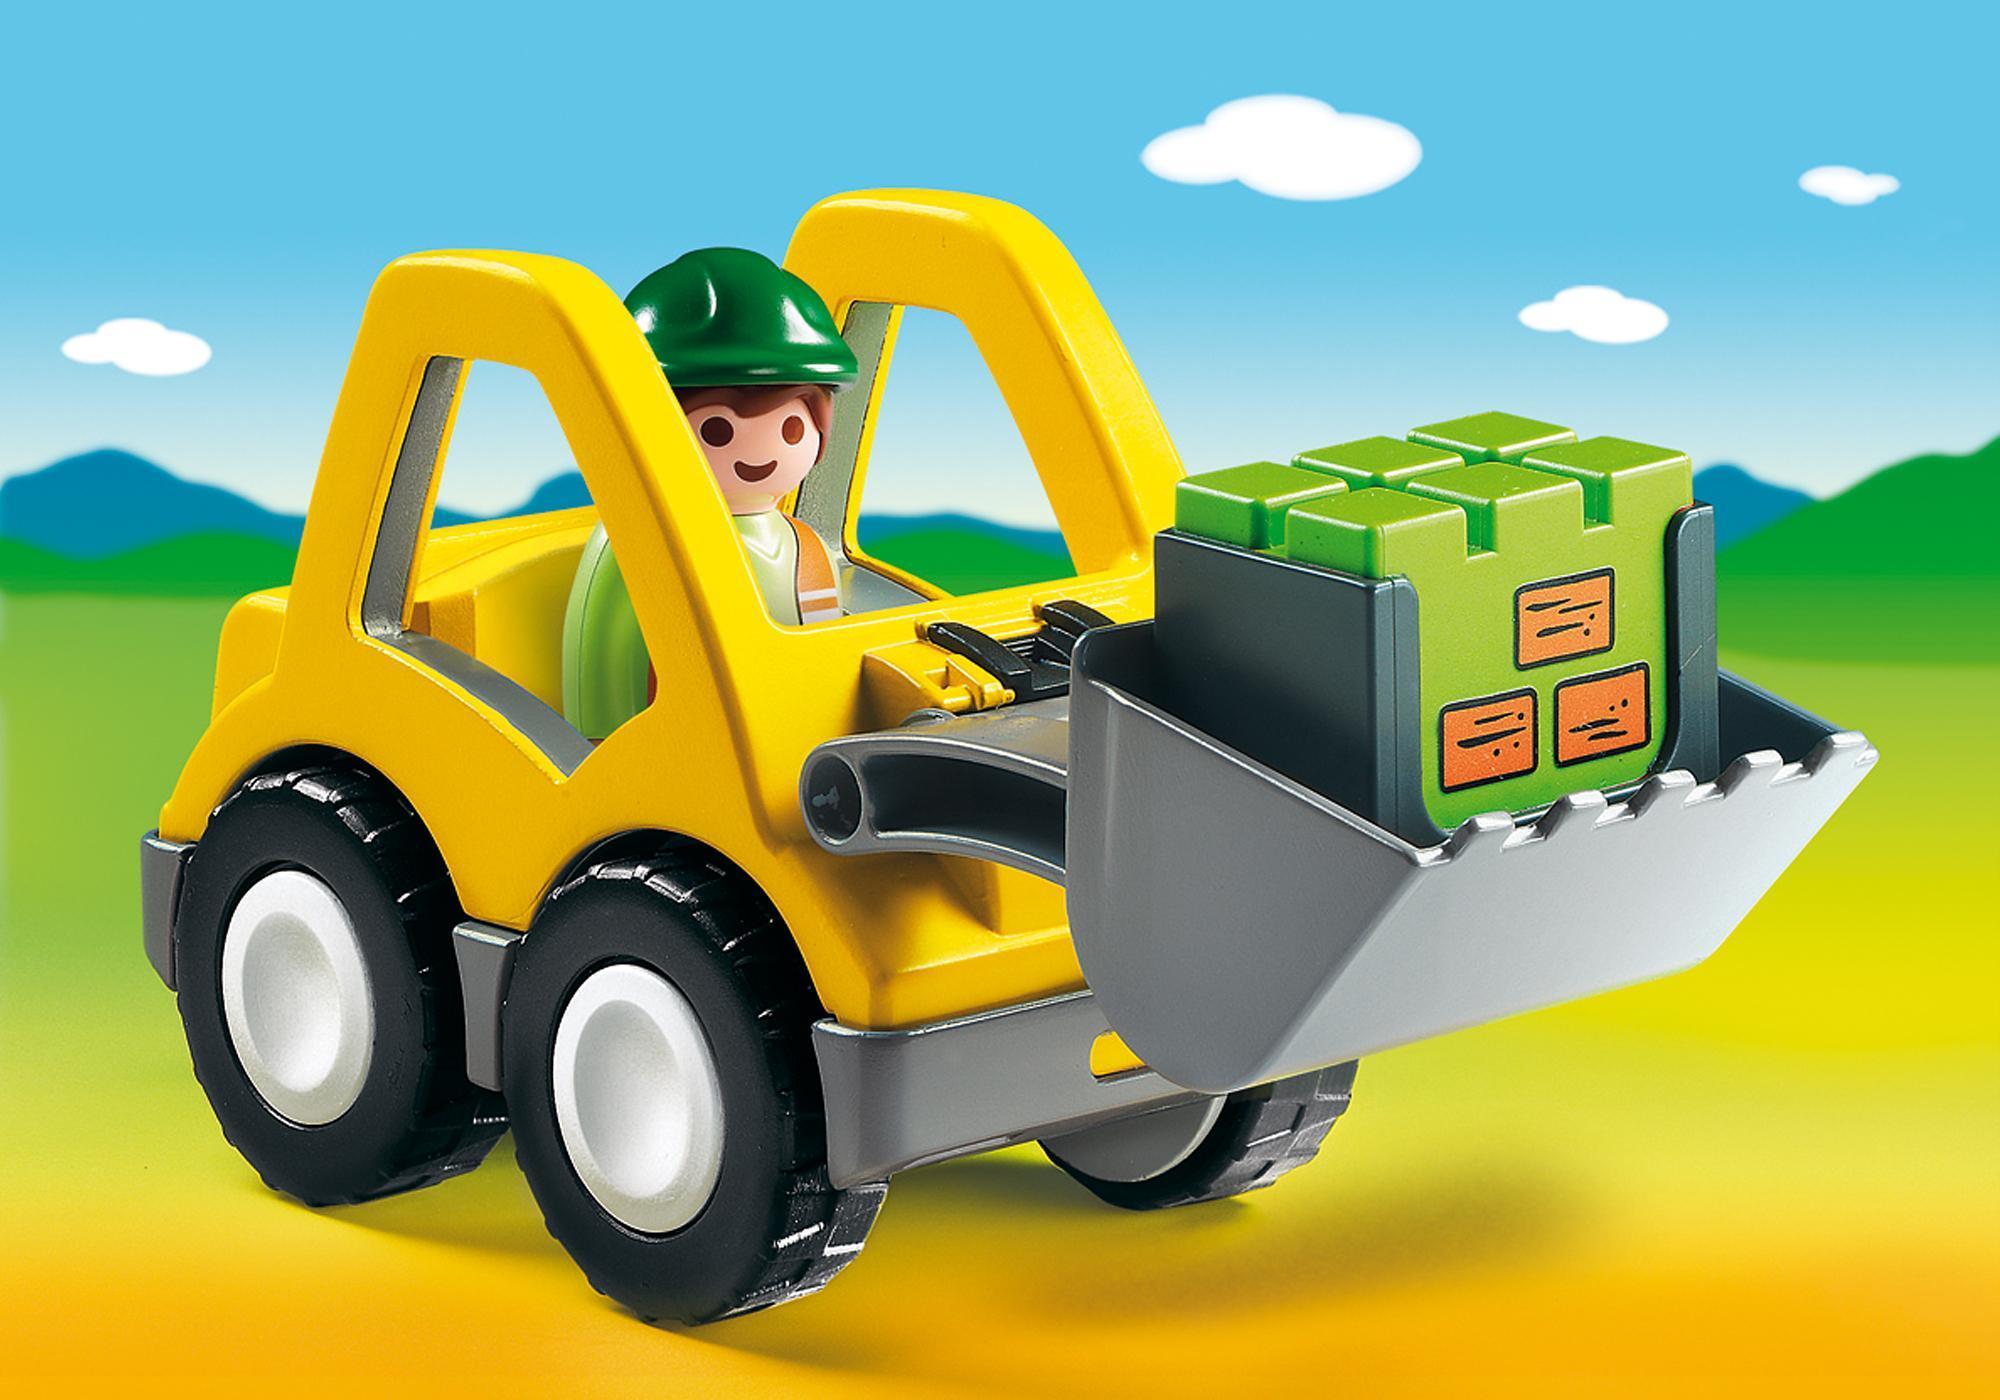 http://media.playmobil.com/i/playmobil/6775_product_detail/Graafmachine met werkman